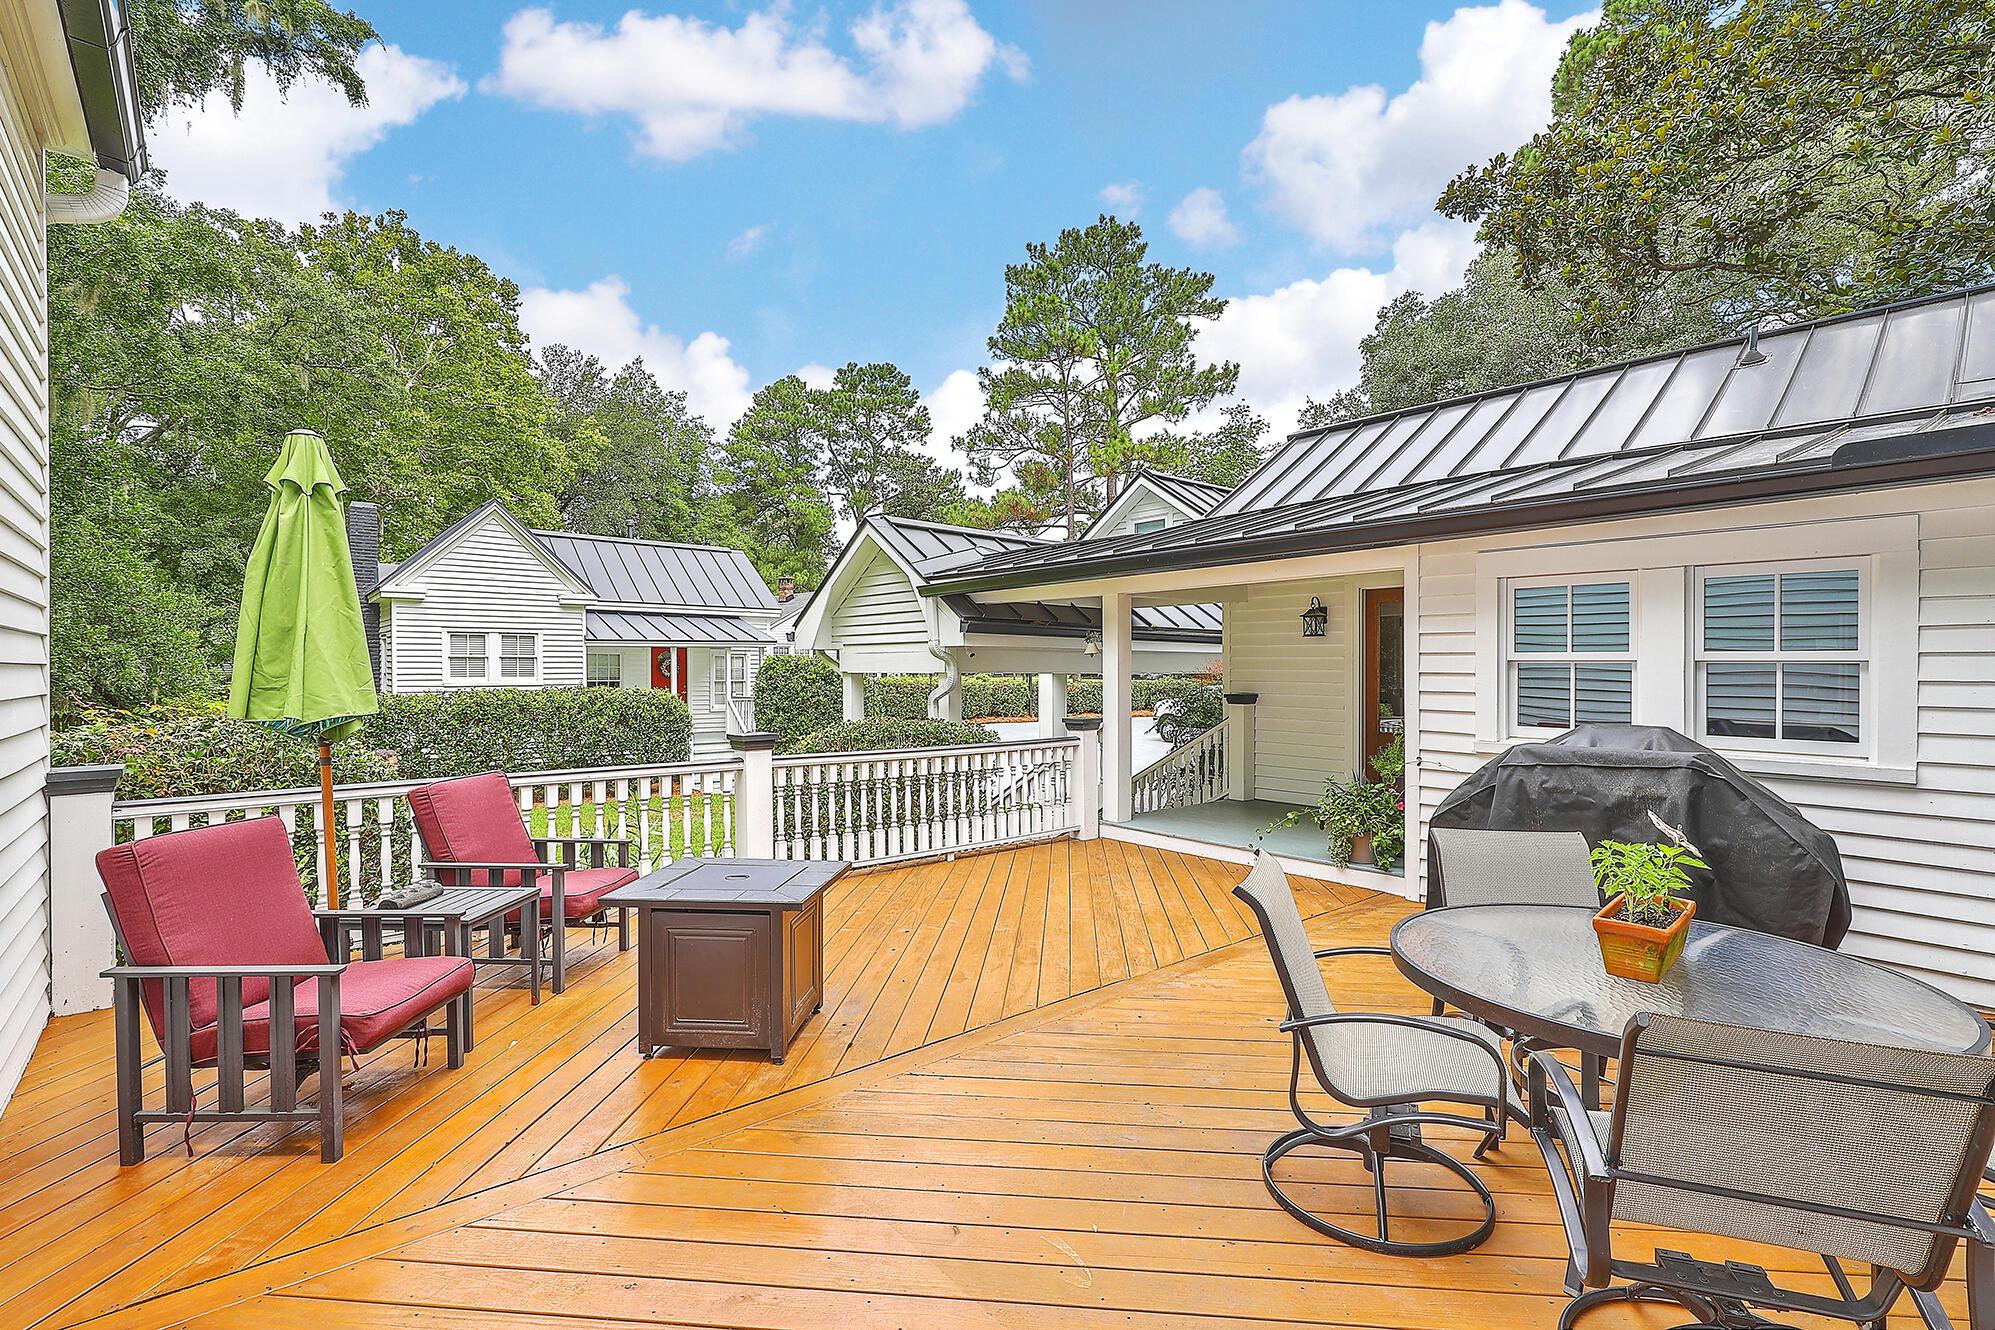 Summerville Homes For Sale - 102 Hickory, Summerville, SC - 23